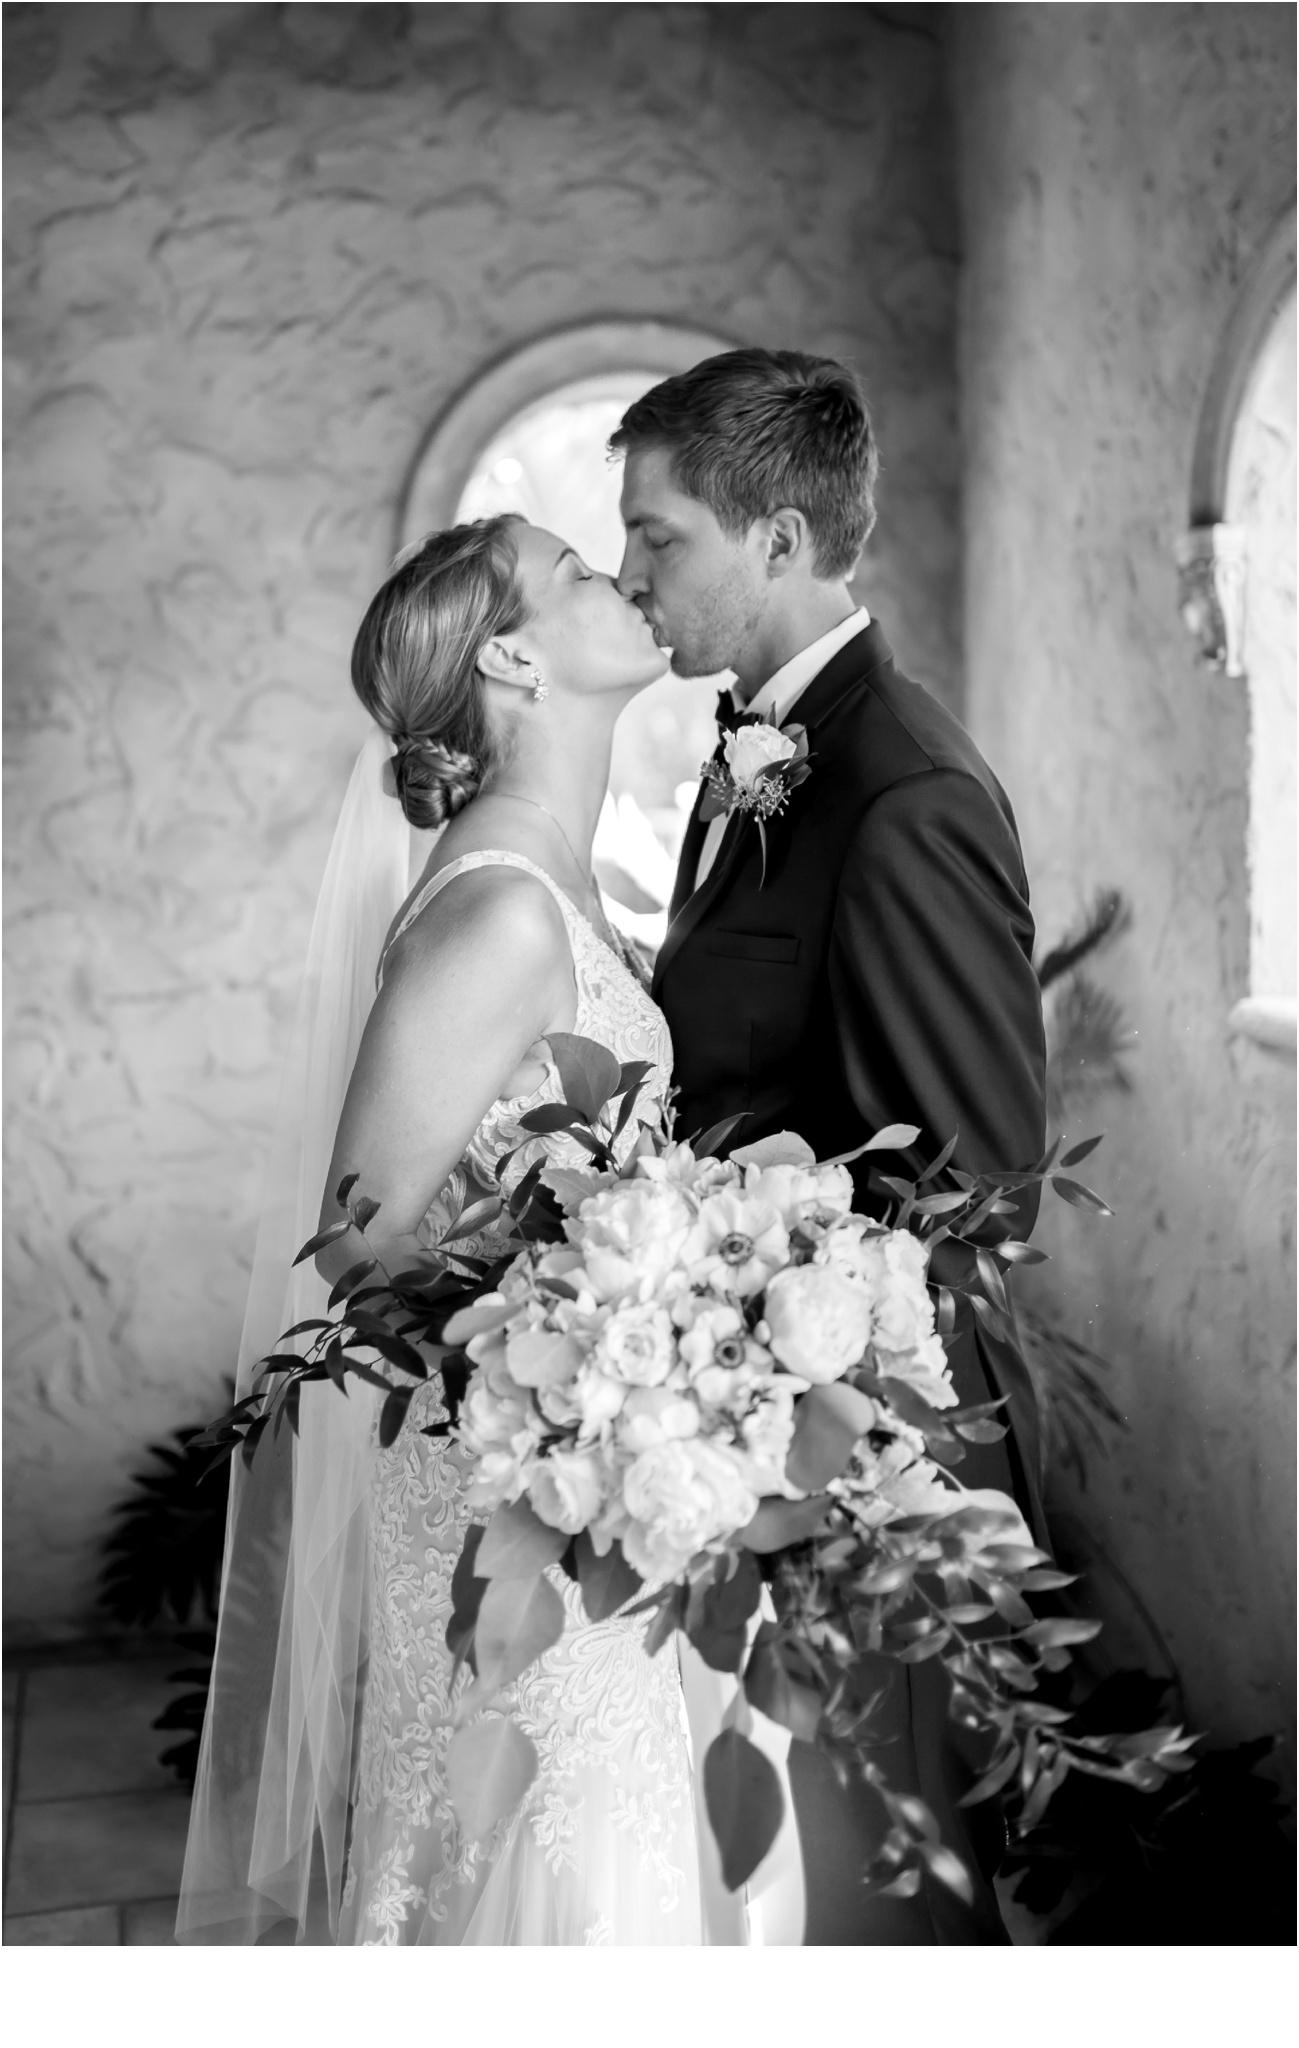 Rainey_Gregg_Photography_St._Simons_Island_Georgia_California_Wedding_Portrait_Photography_0667.jpg